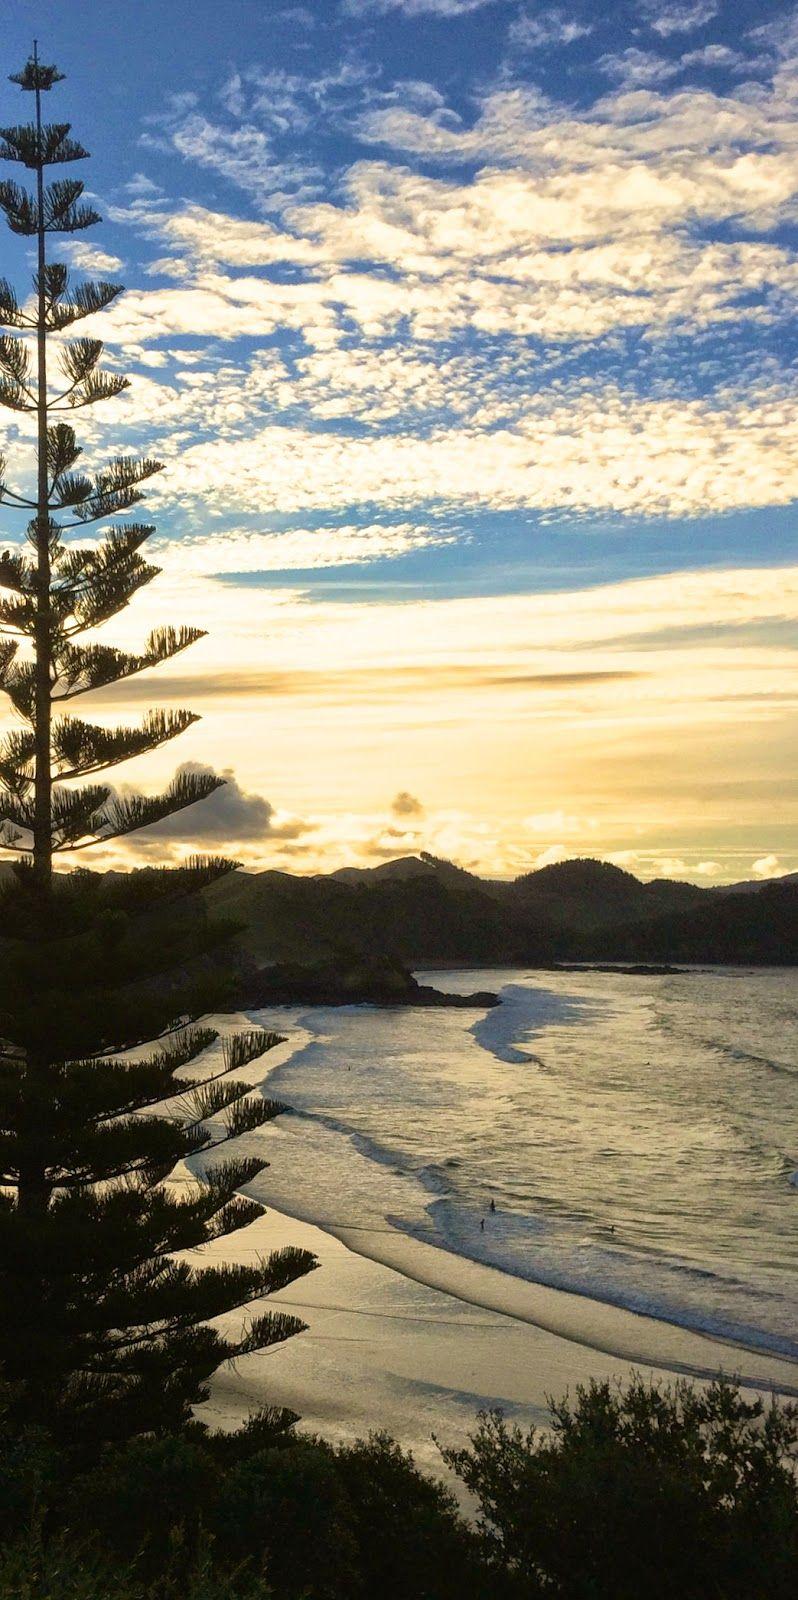 Bay of Islands - Sunset